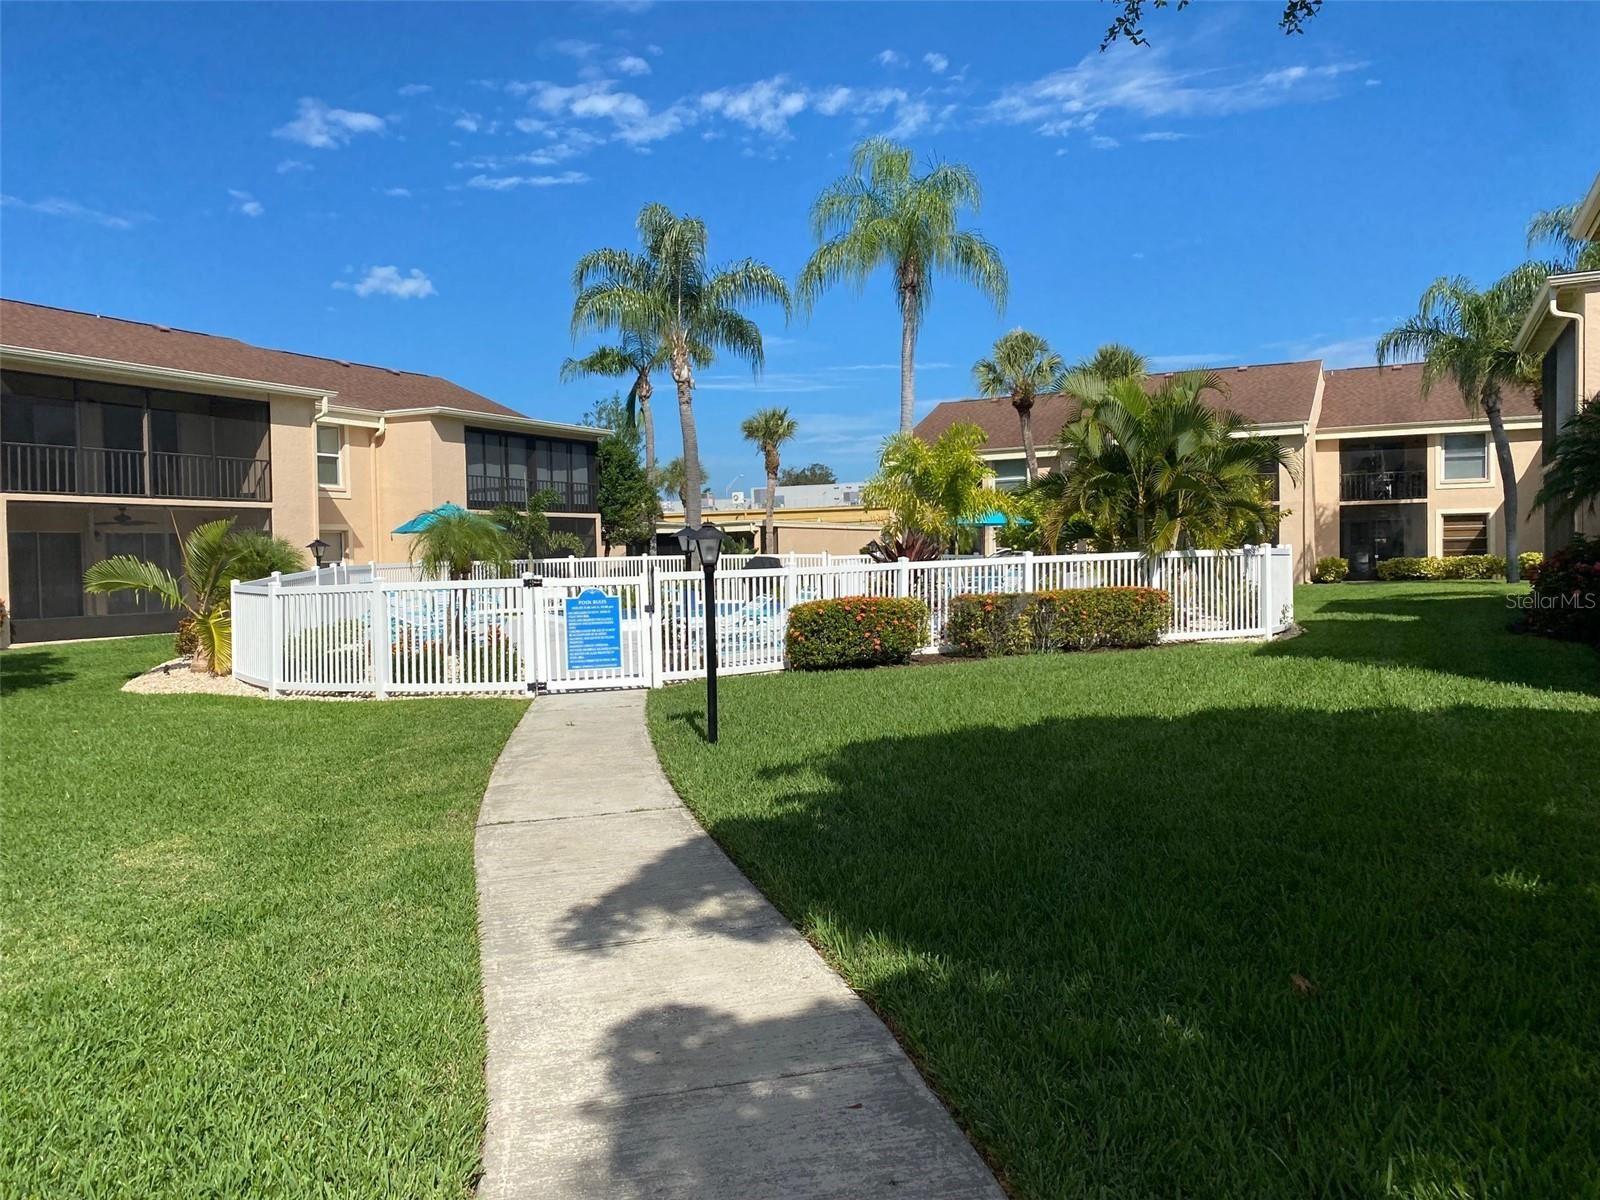 Photo of 6028 7TH AVENUE W #6028, BRADENTON, FL 34209 (MLS # A4515857)